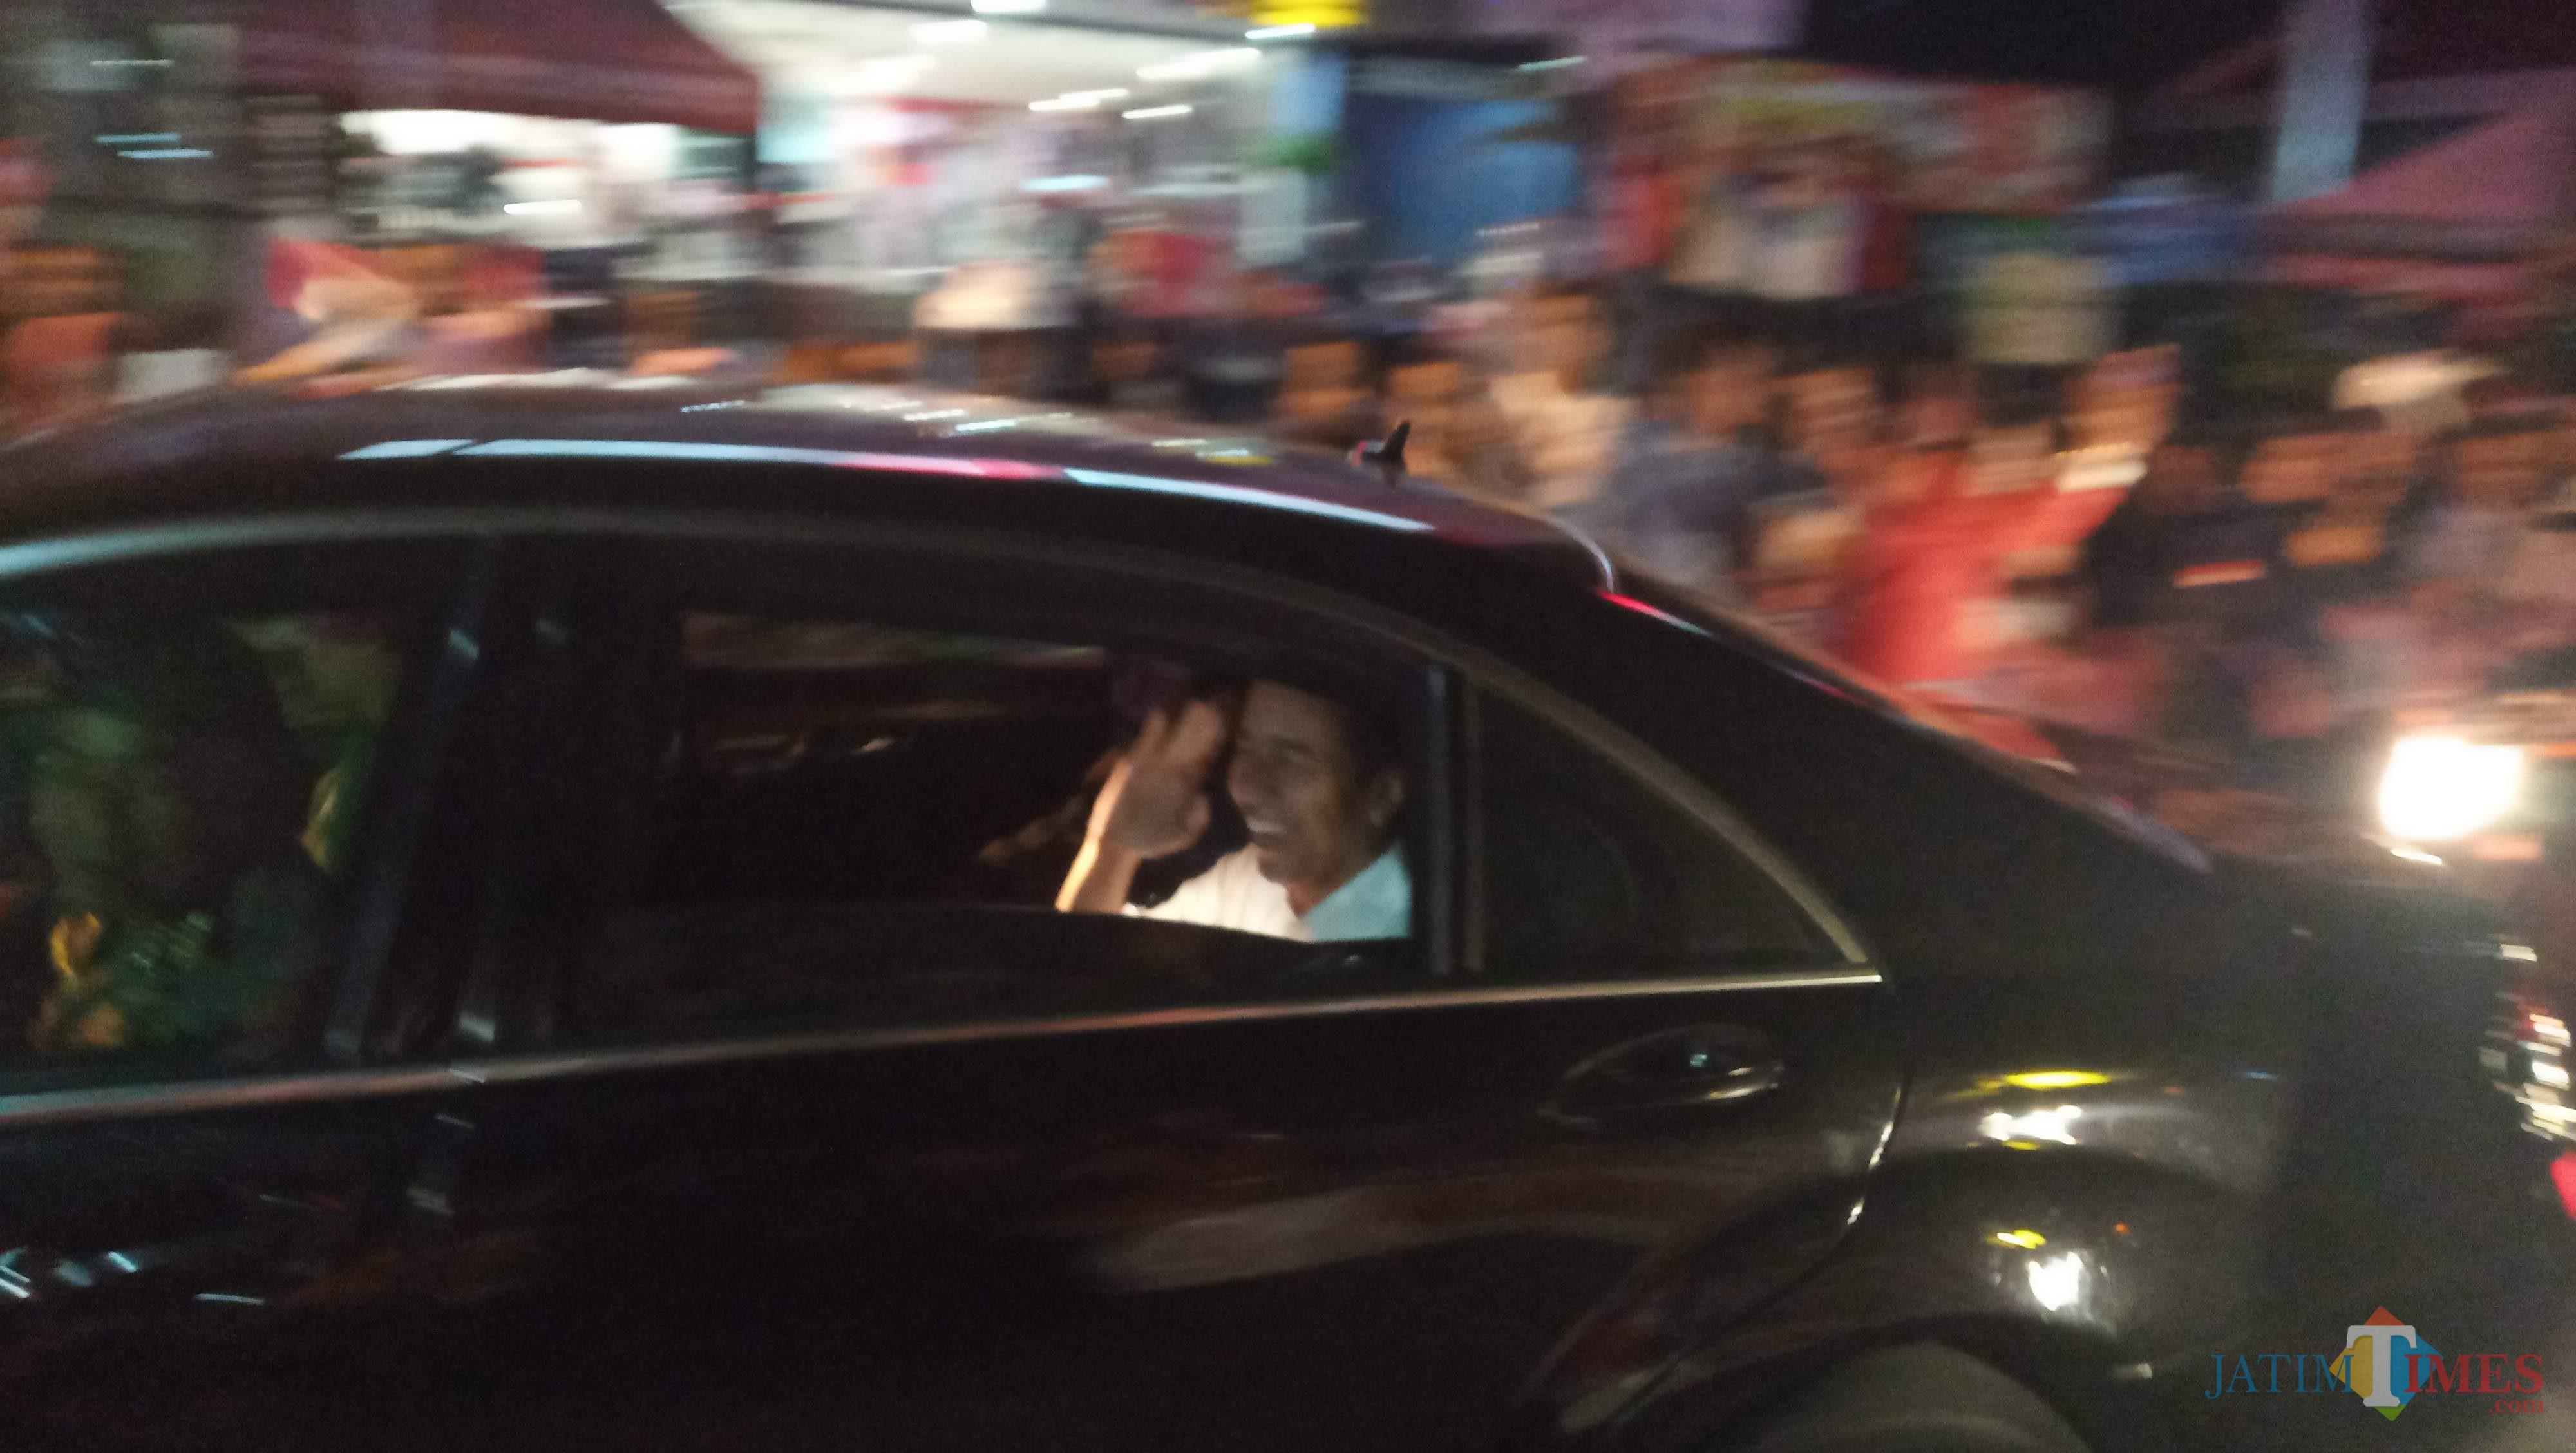 Jokowi saat tiba di Tulungagung (foto :Joko Pramono/Jatimtimes)